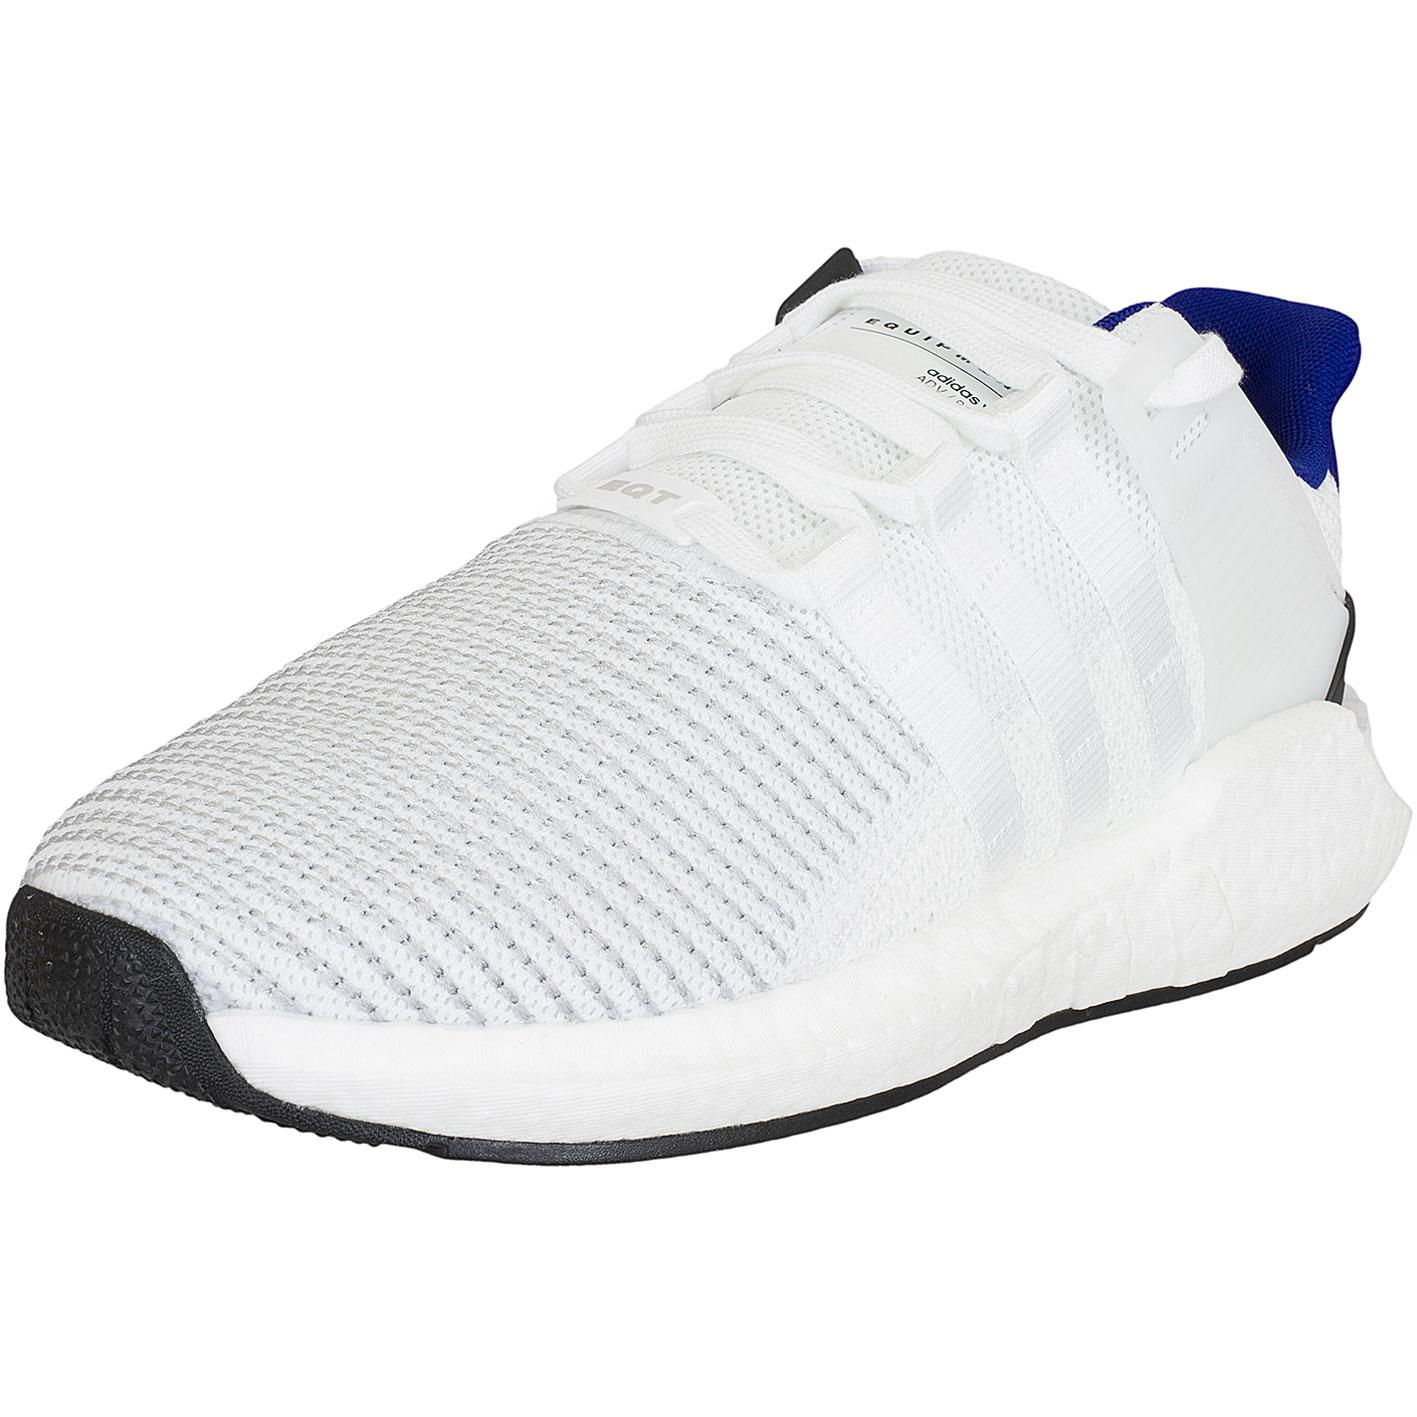 9b8739ff1799e3 ☆ Adidas Originals Sneaker Equipment Support 93 17 weiß schwarz ...